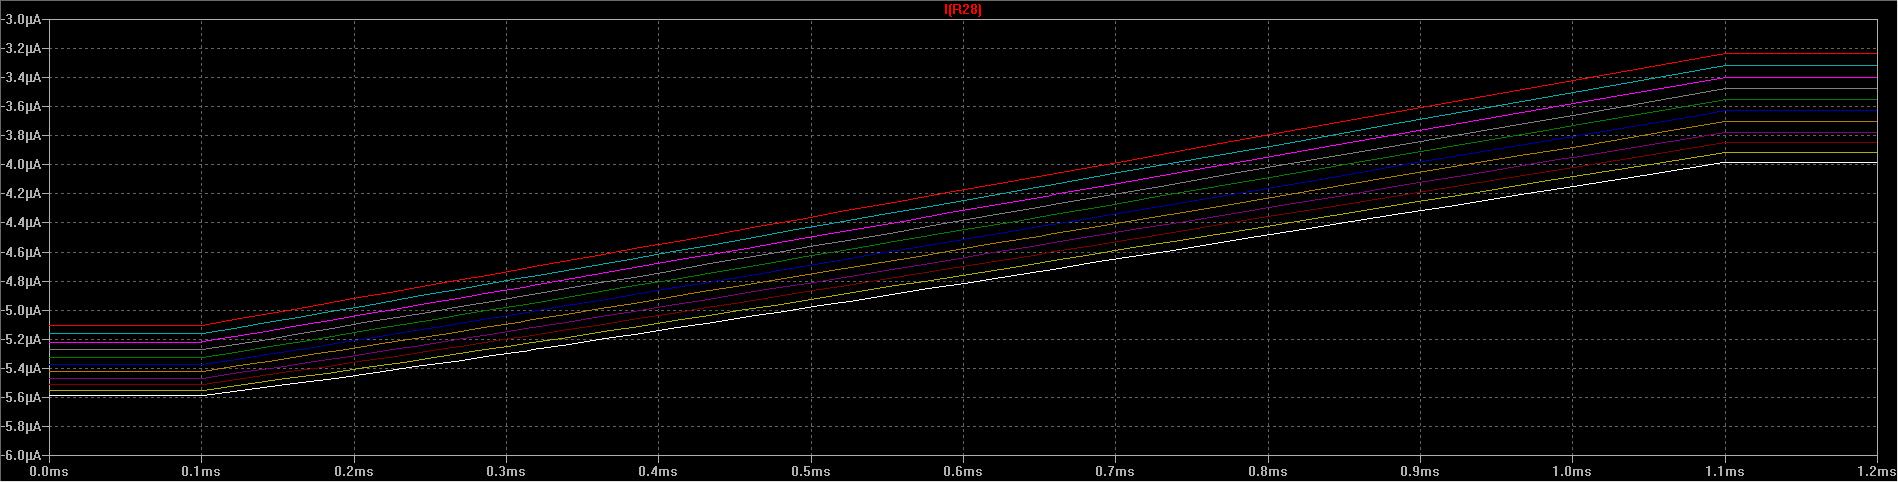 simulations/LTSpice/VCO-1_10V_VOCT_Trim_Steps.png